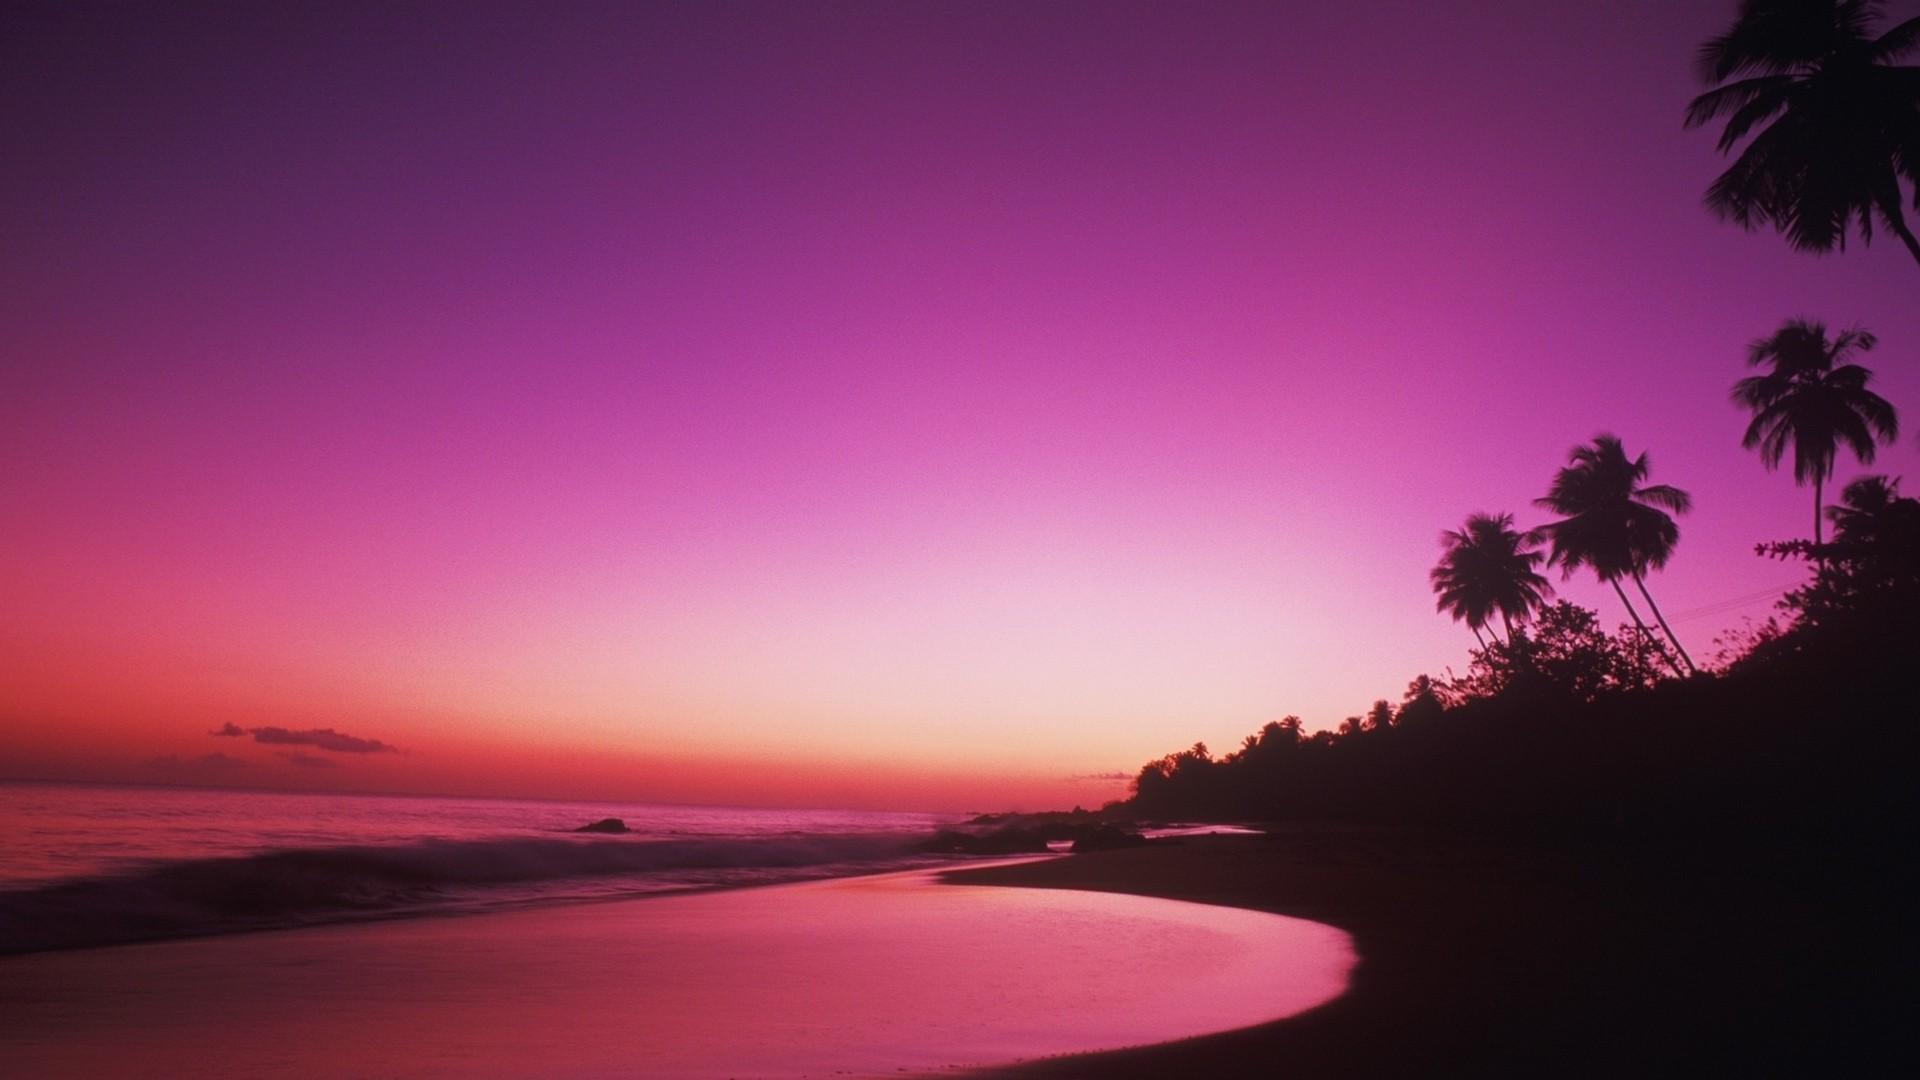 Pink Sunset Wallpaper theme